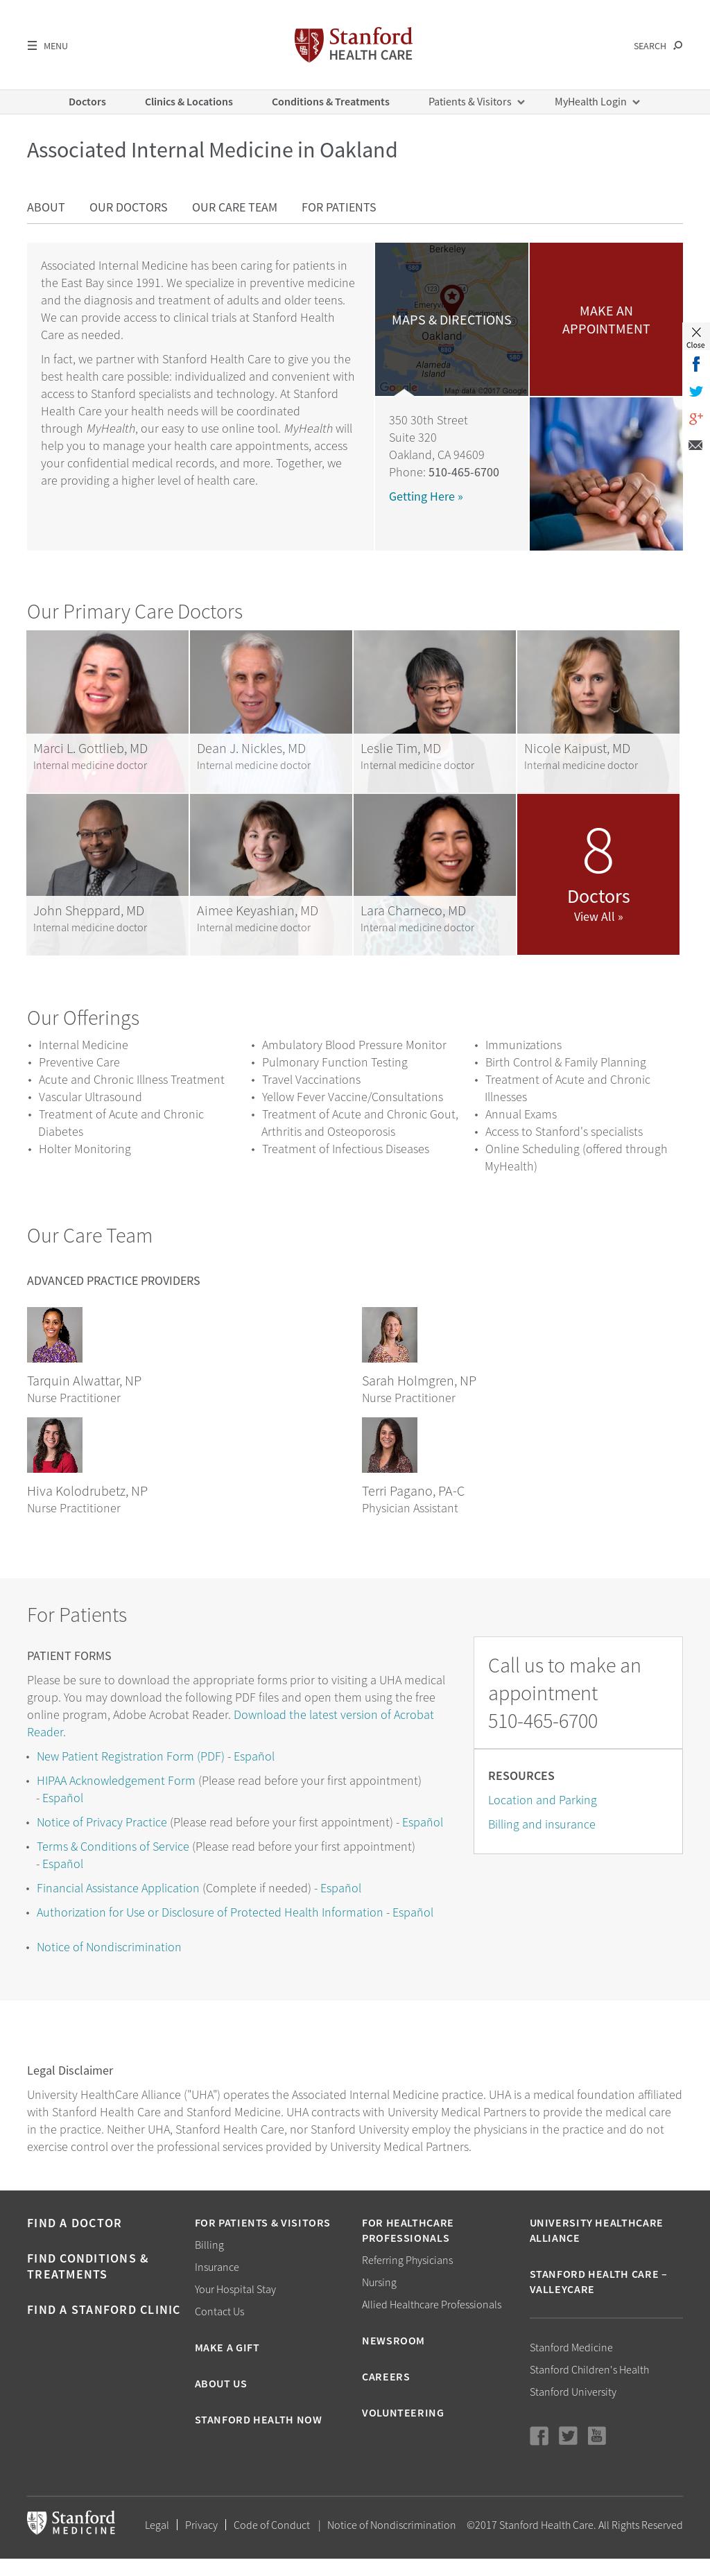 Associated Internal Medicine Competitors, Revenue and